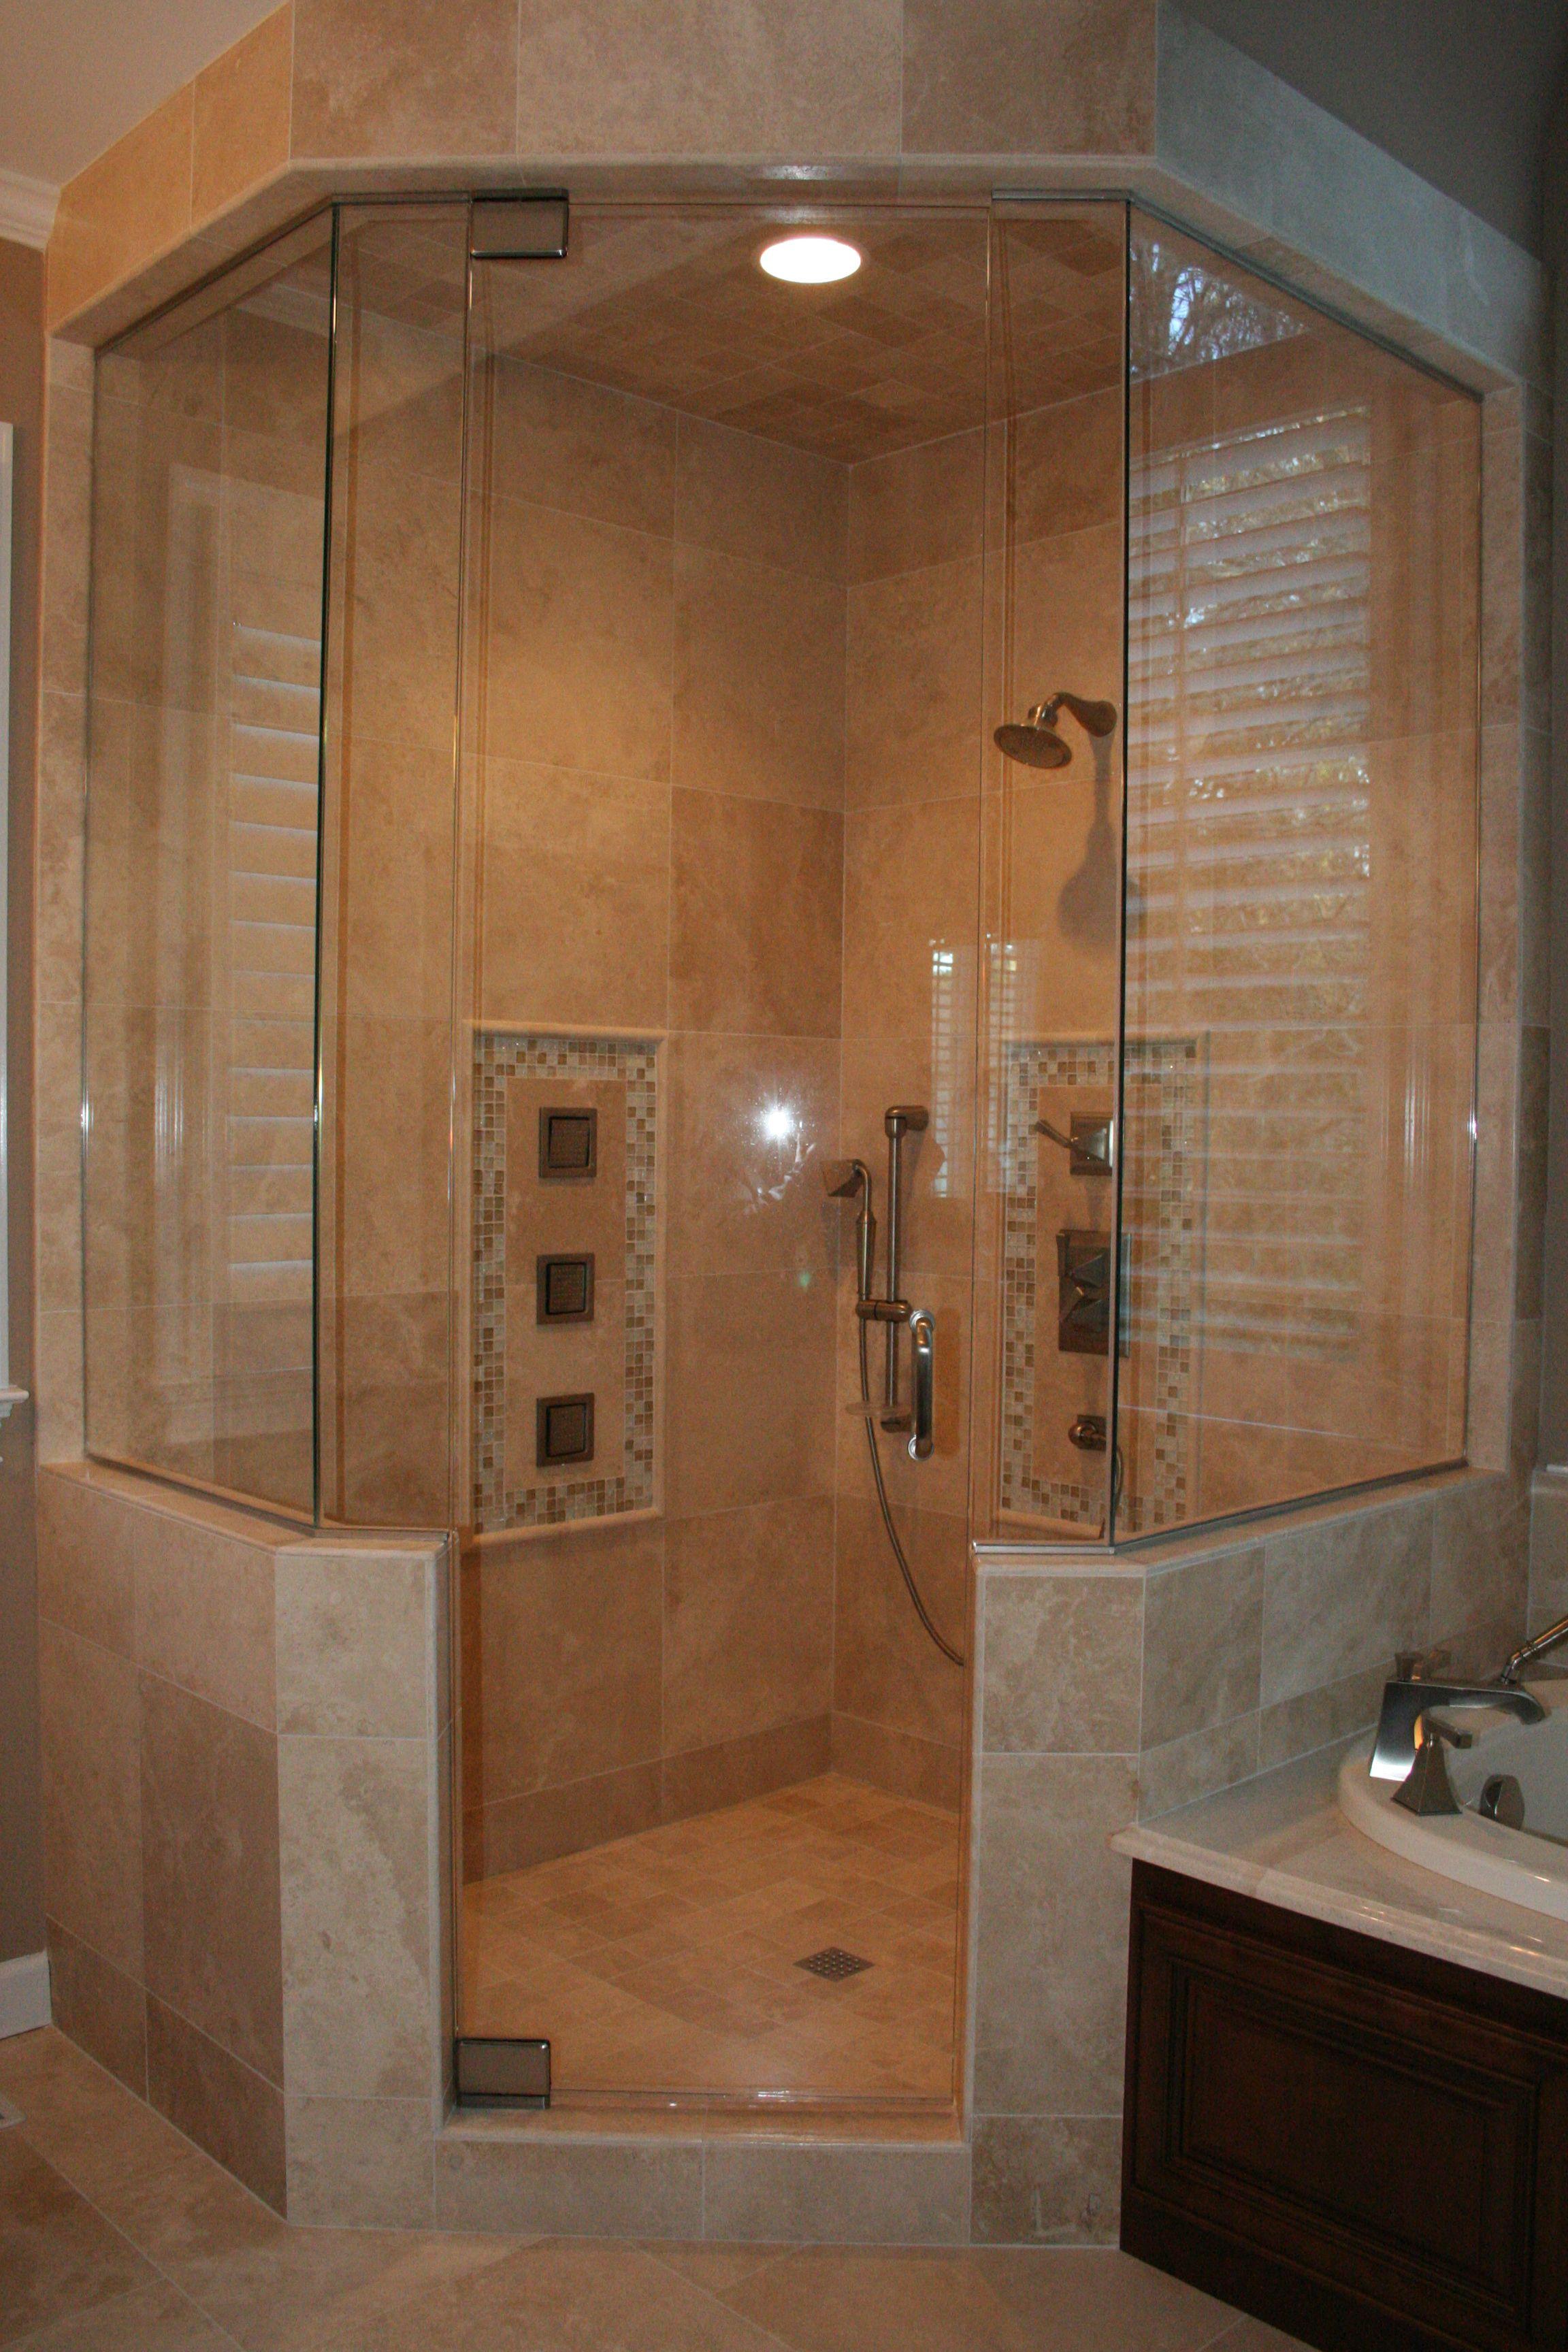 Maximize Corner Of Your Bathroom Using Neo Angle Shower: amusing ...